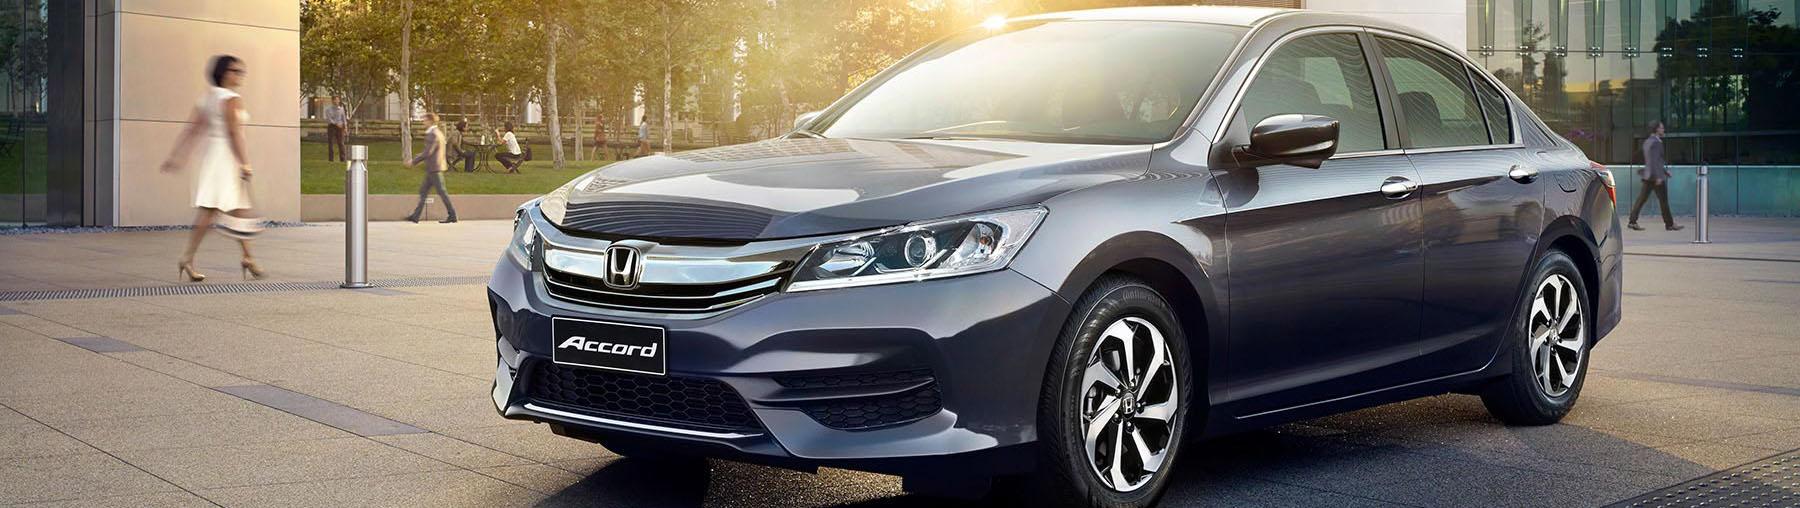 Honda finance brisbane austral honda for Honda finance deals